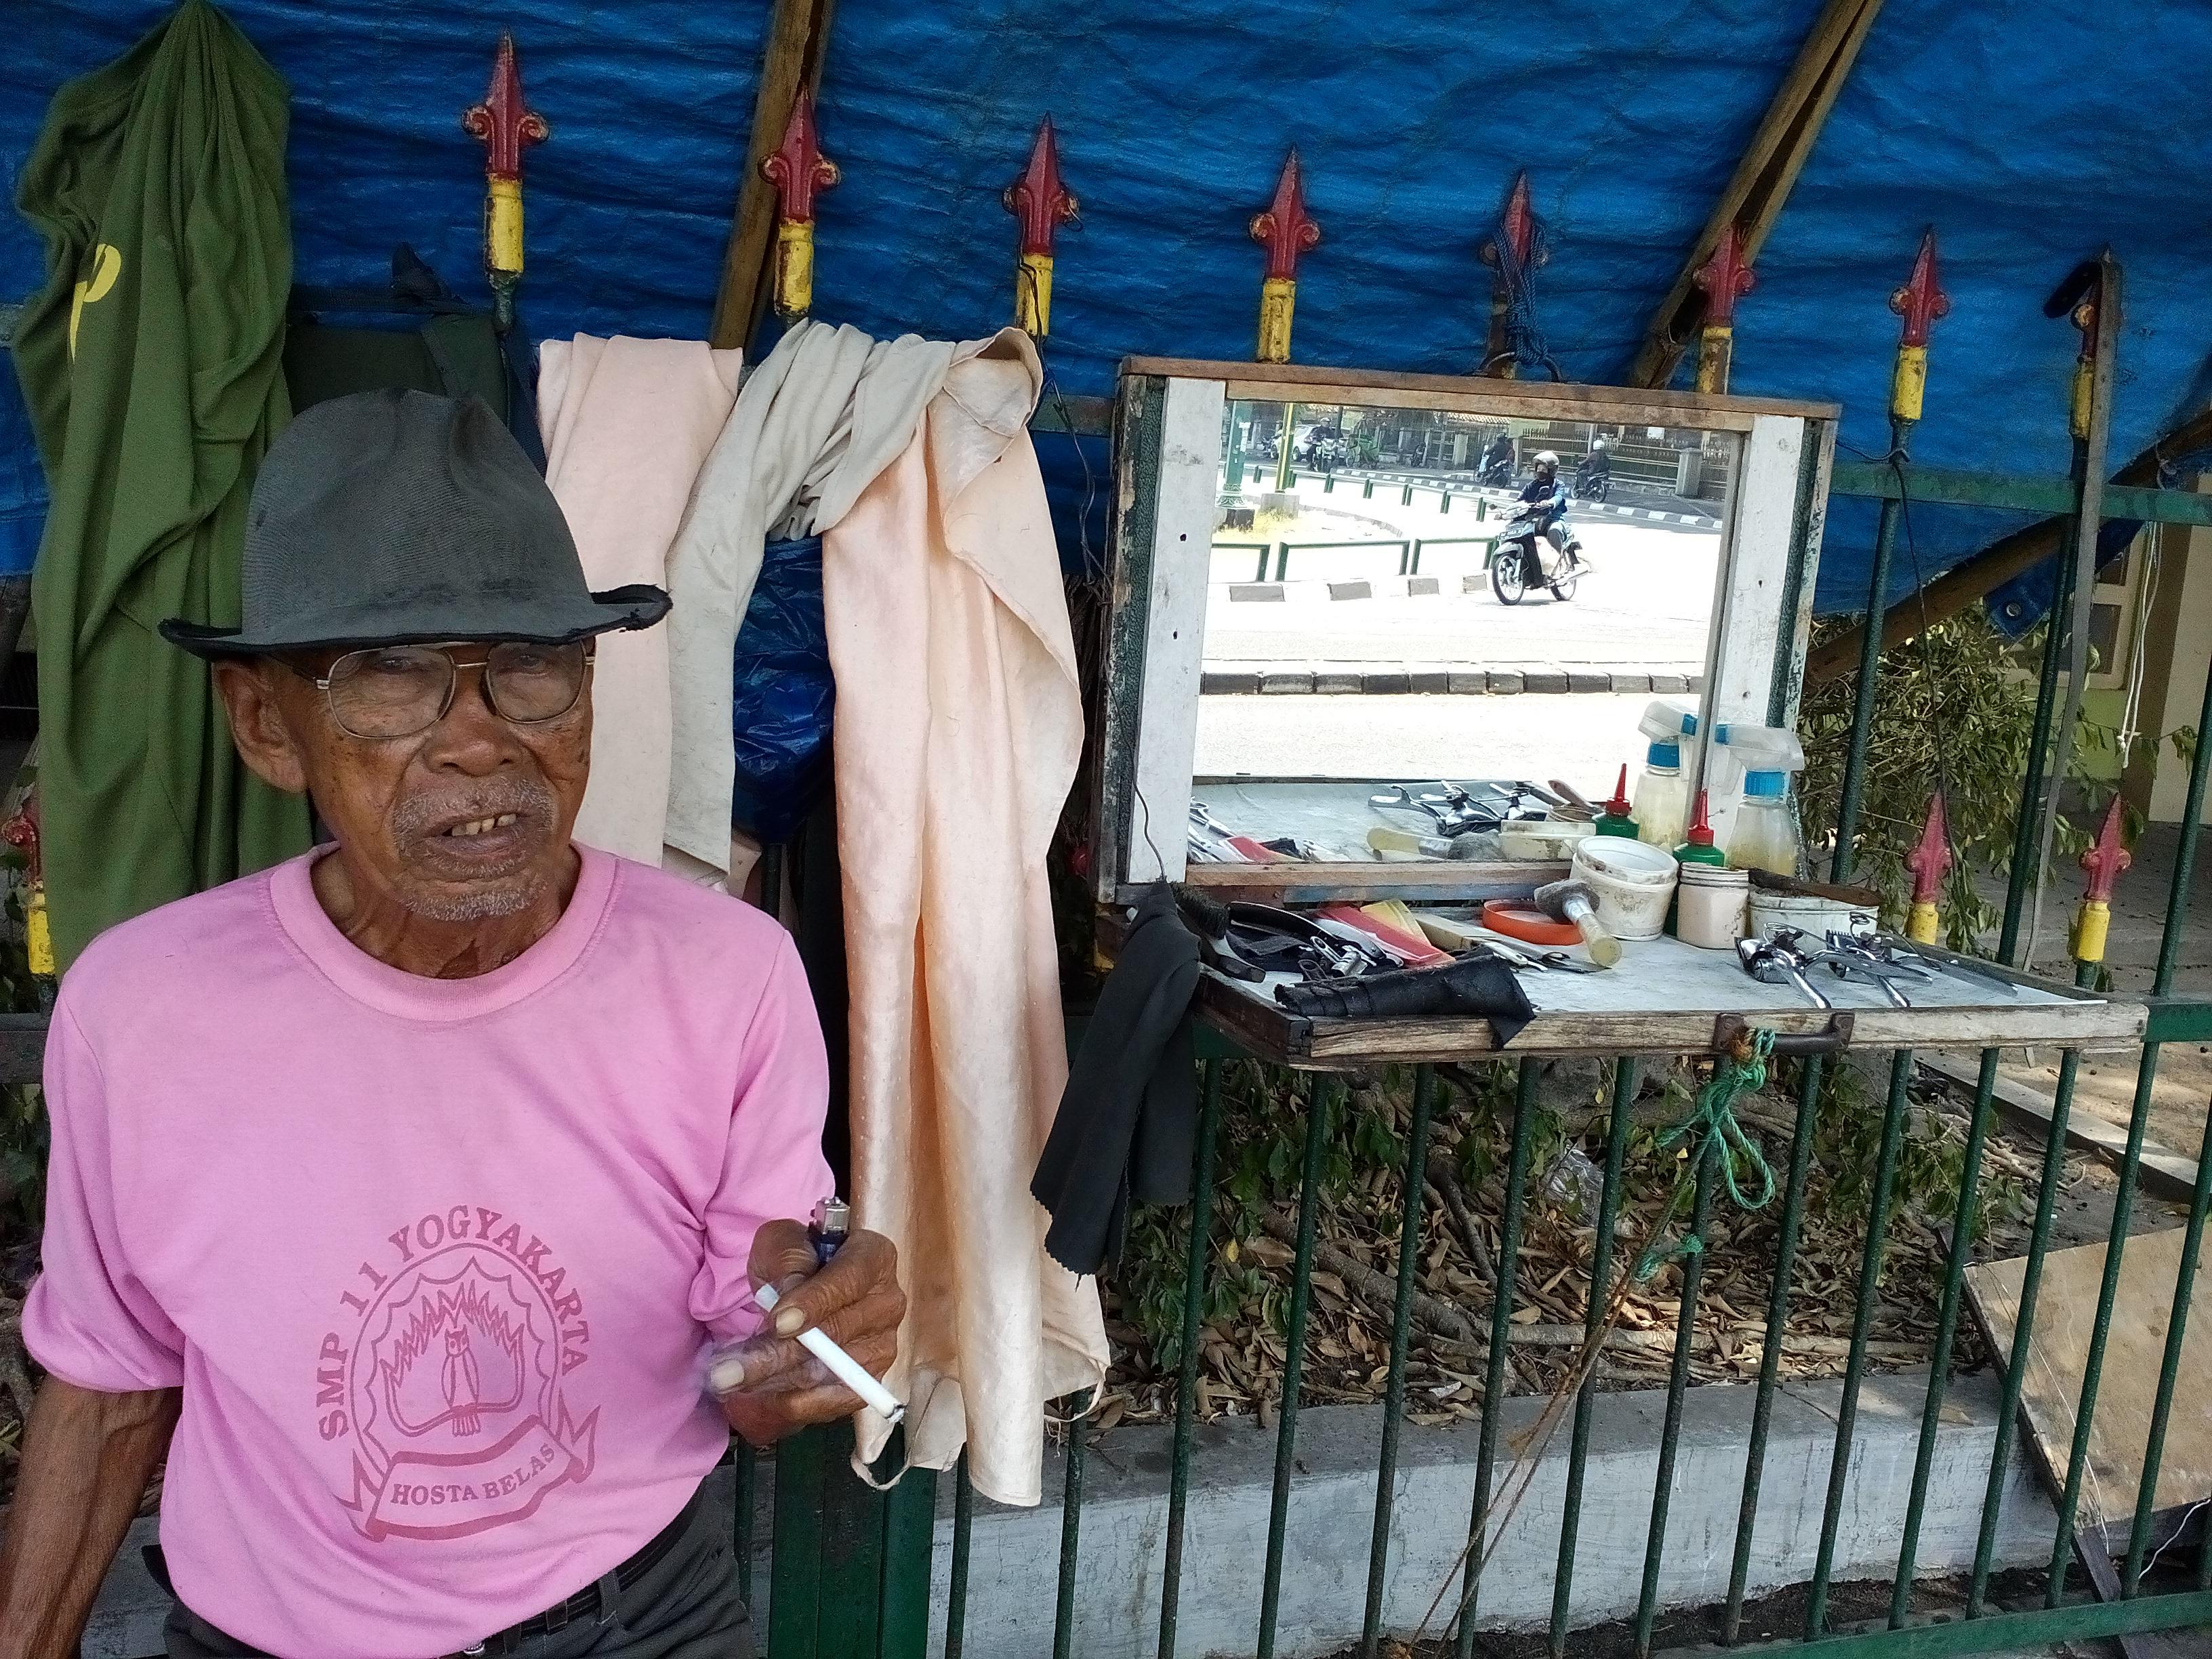 Mbah Narto tukang cukur pinggir jalan yang punya pelanggan anggota DPR